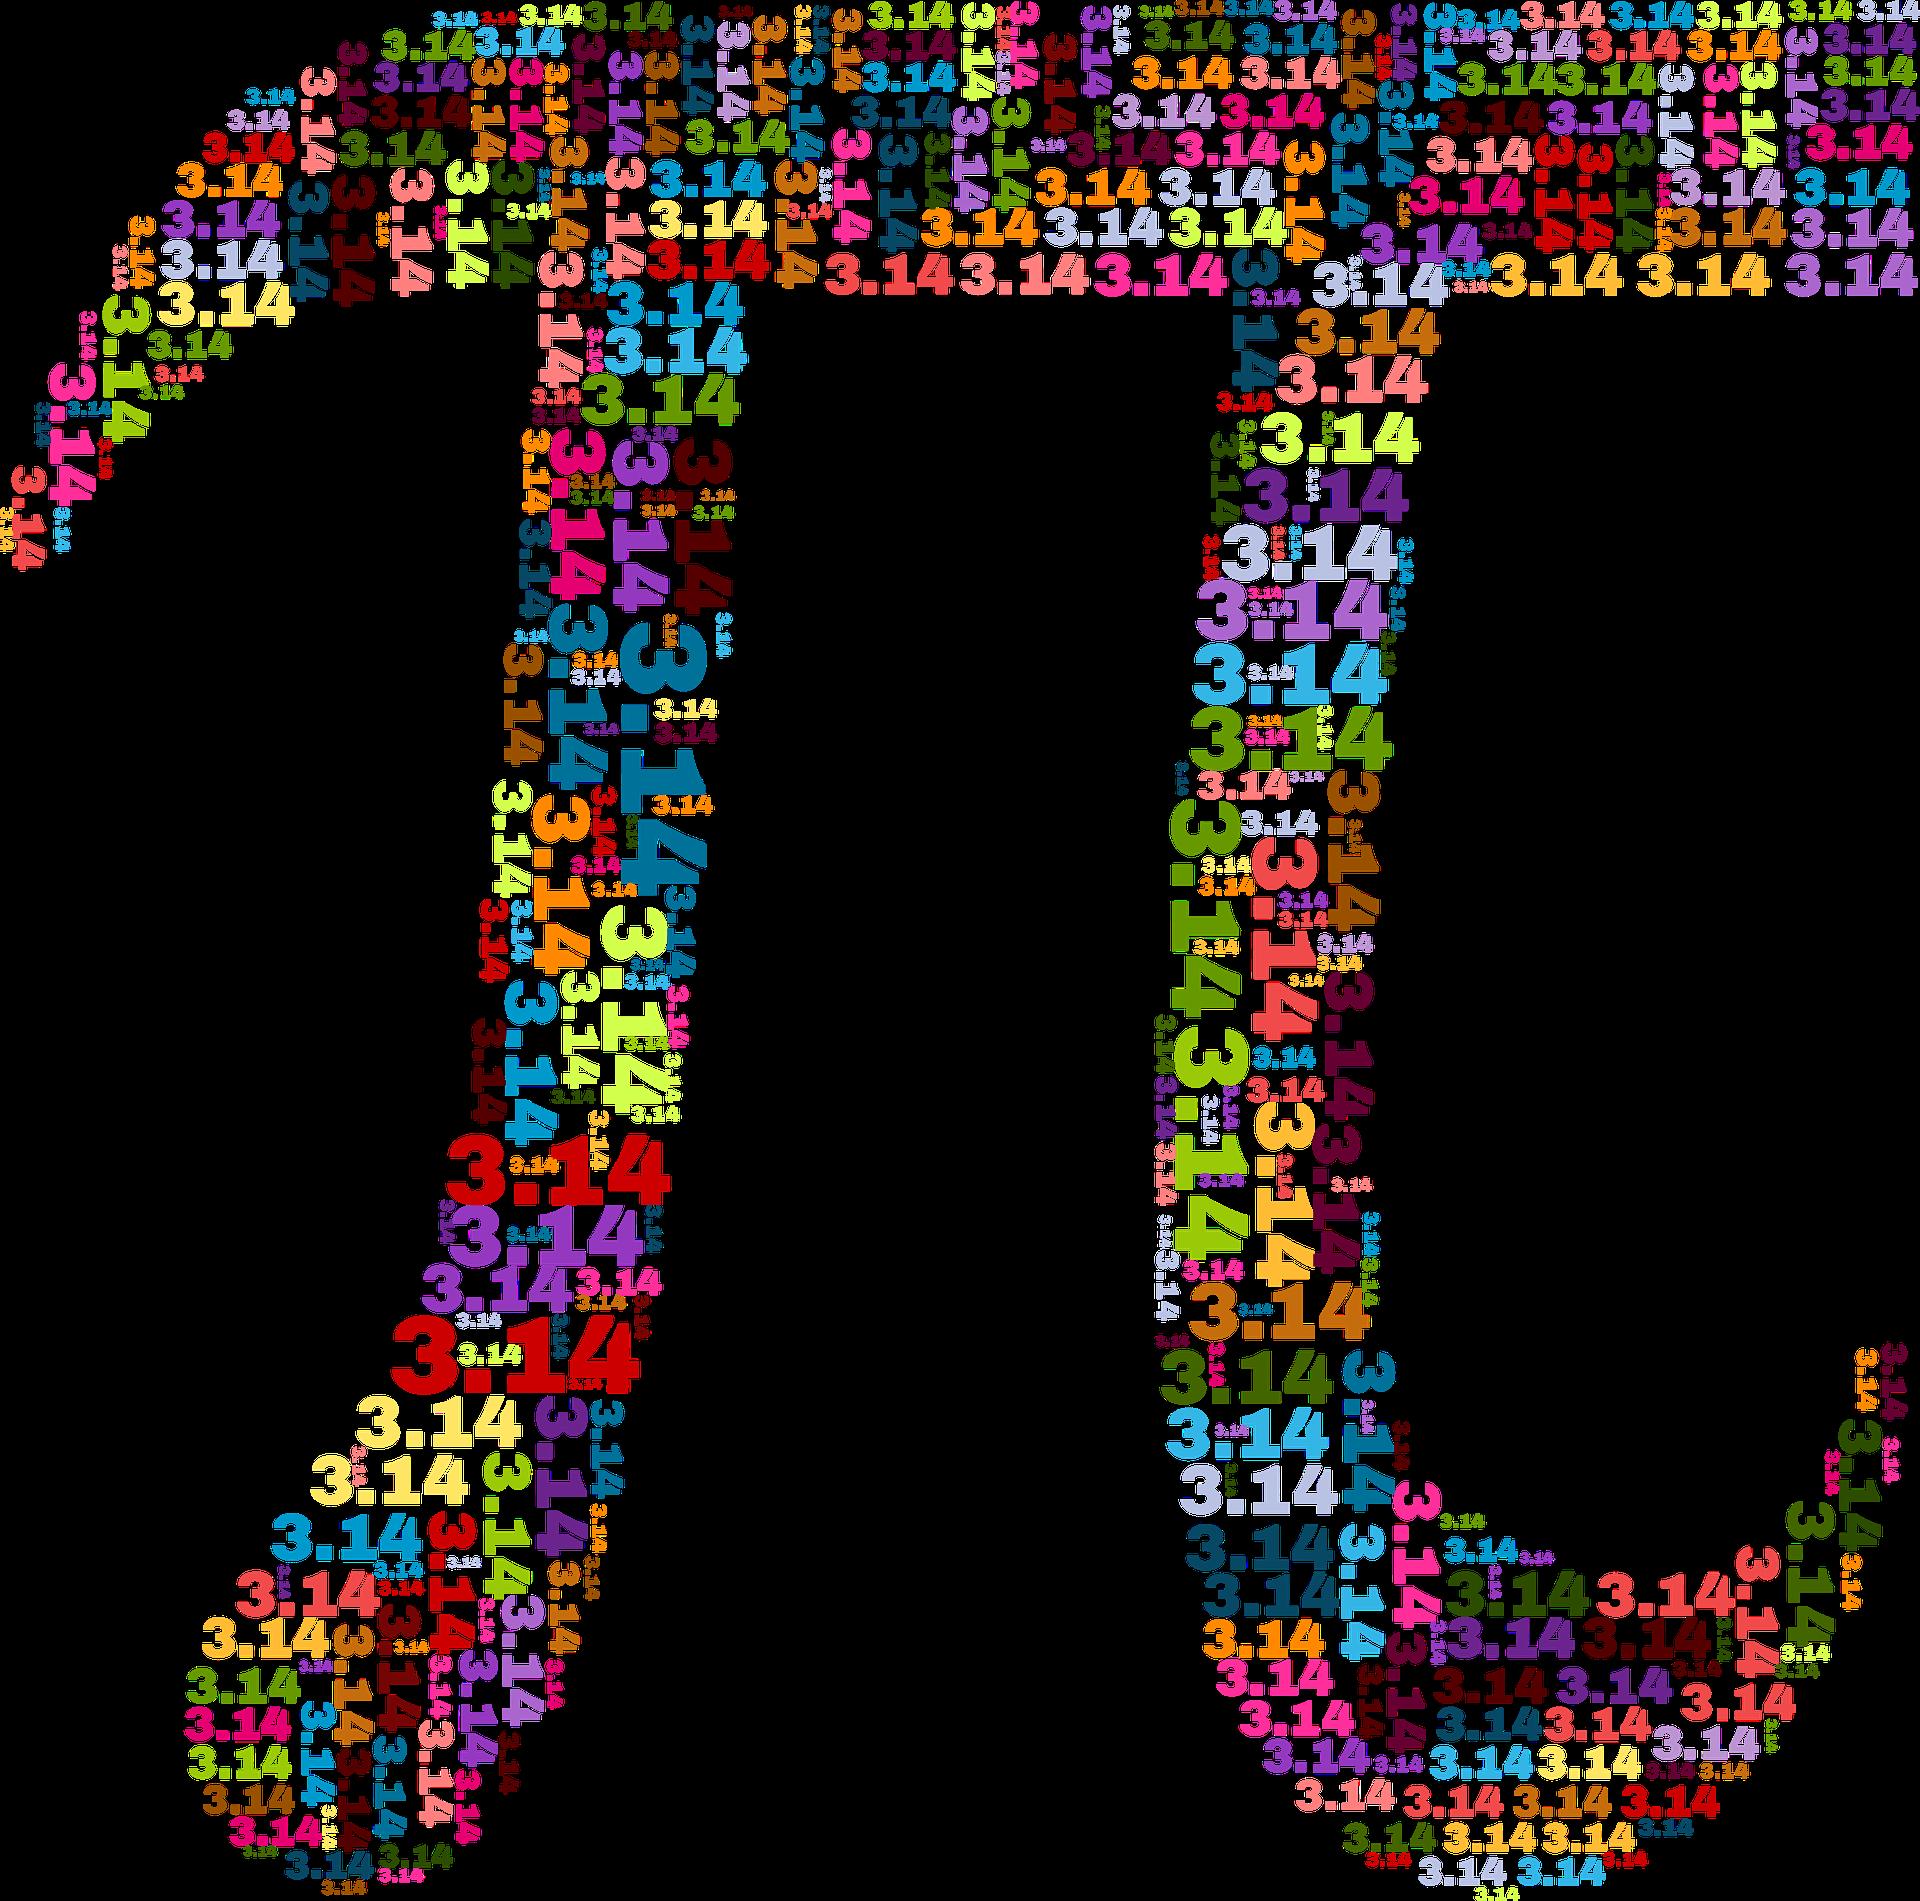 Pi symbol with pi written inside.